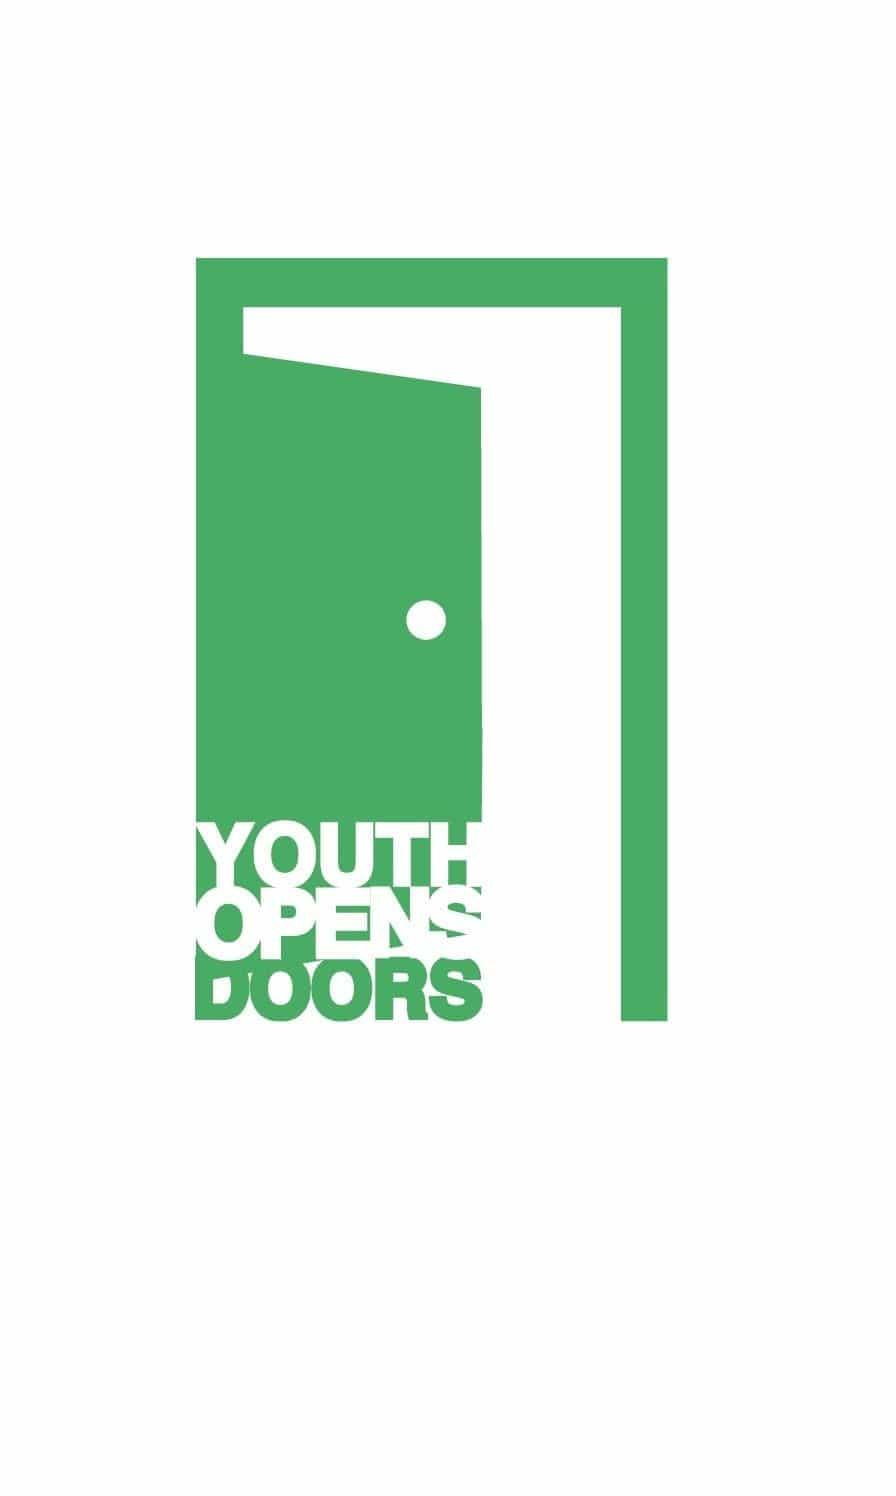 Herencia acogerá a 60 jóvenes europeos con dos proyectos Erasmus+ 4